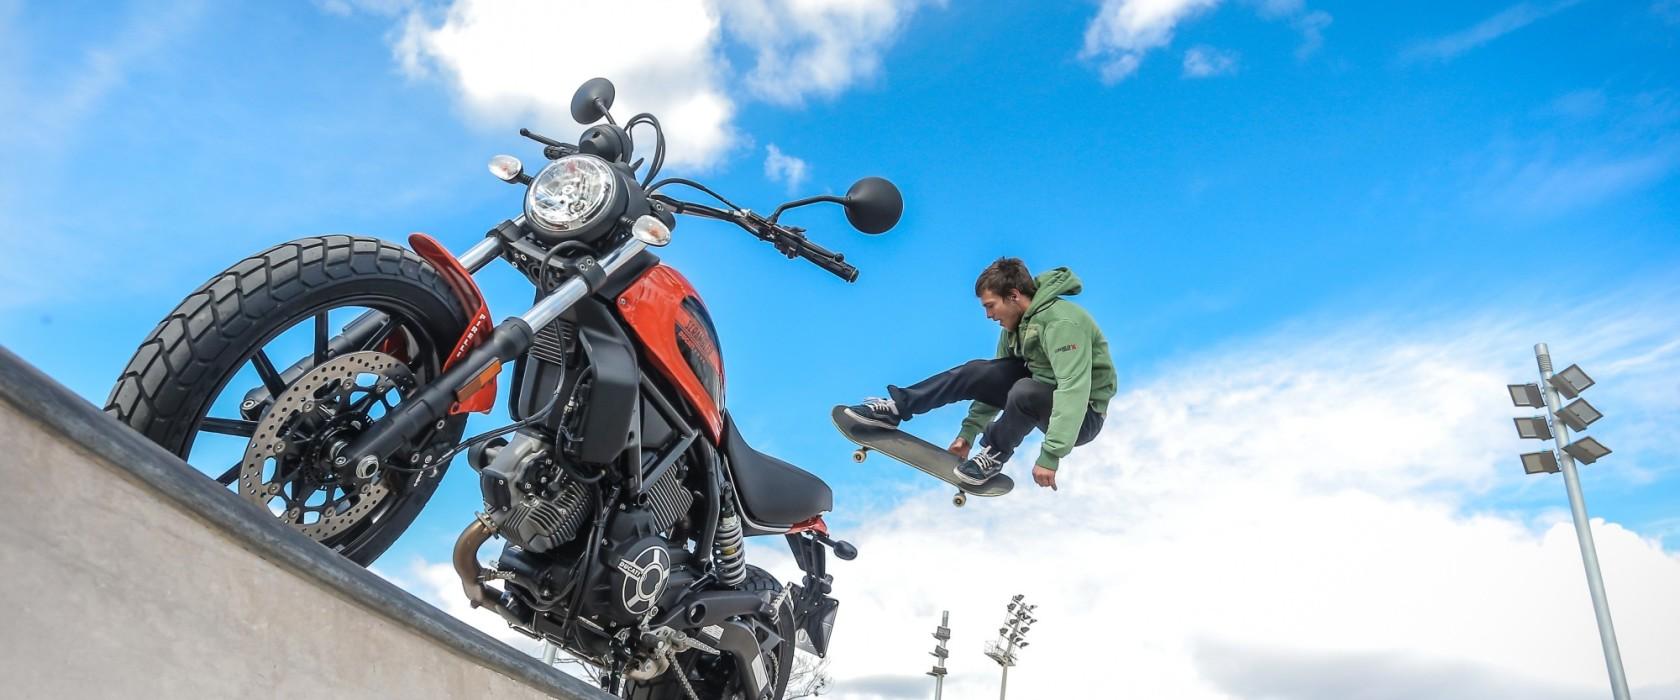 DucatiScrambler62MartiB_2016_70